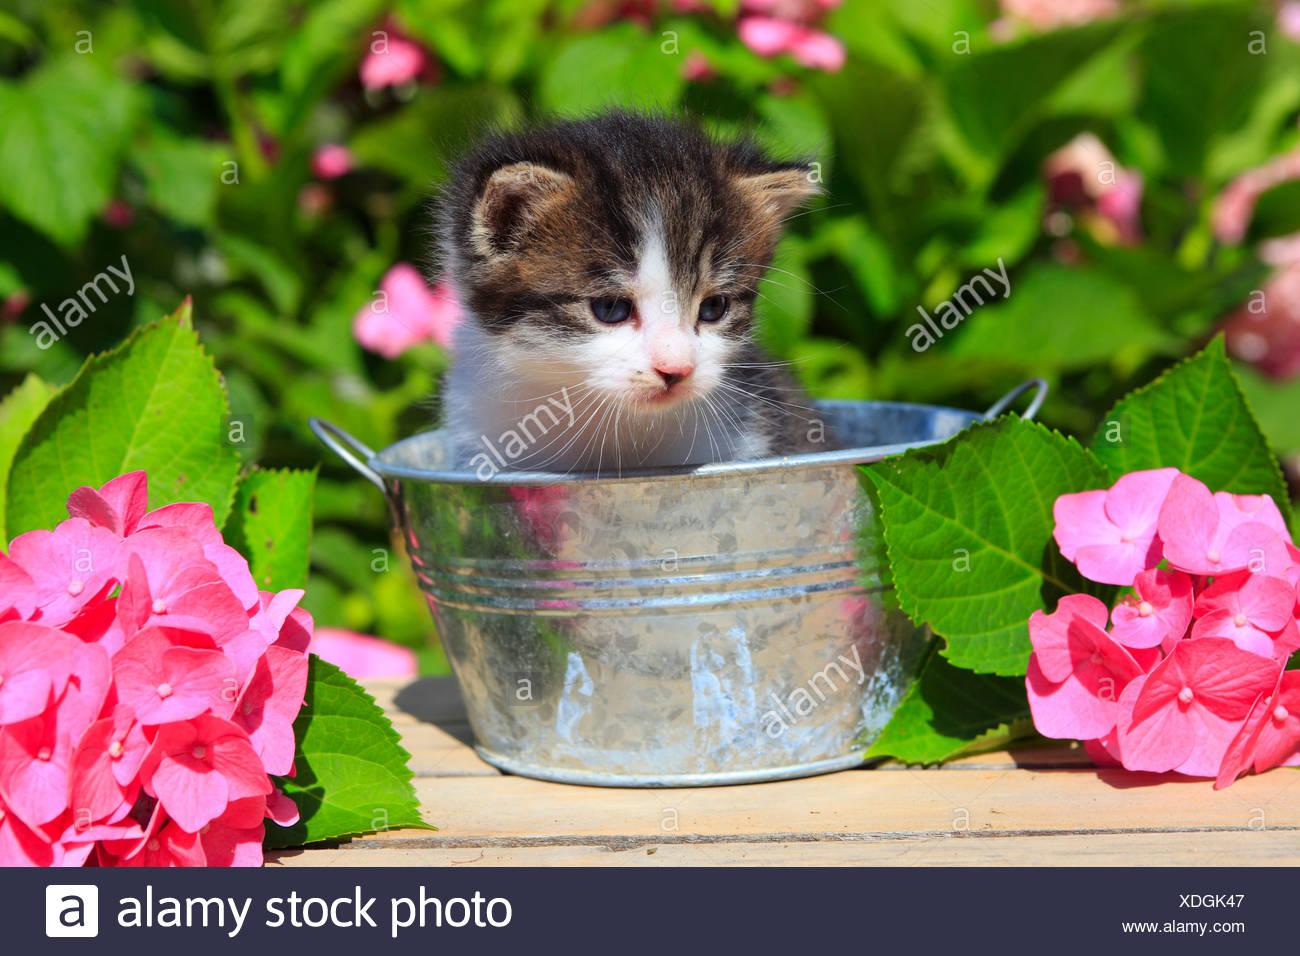 3 weeks, flower, flowers, garden, house, home, Animal, domestic animal, pet, young, cat, jug, kitten, tiger, Tigerli, vase, tub, - Stock Image